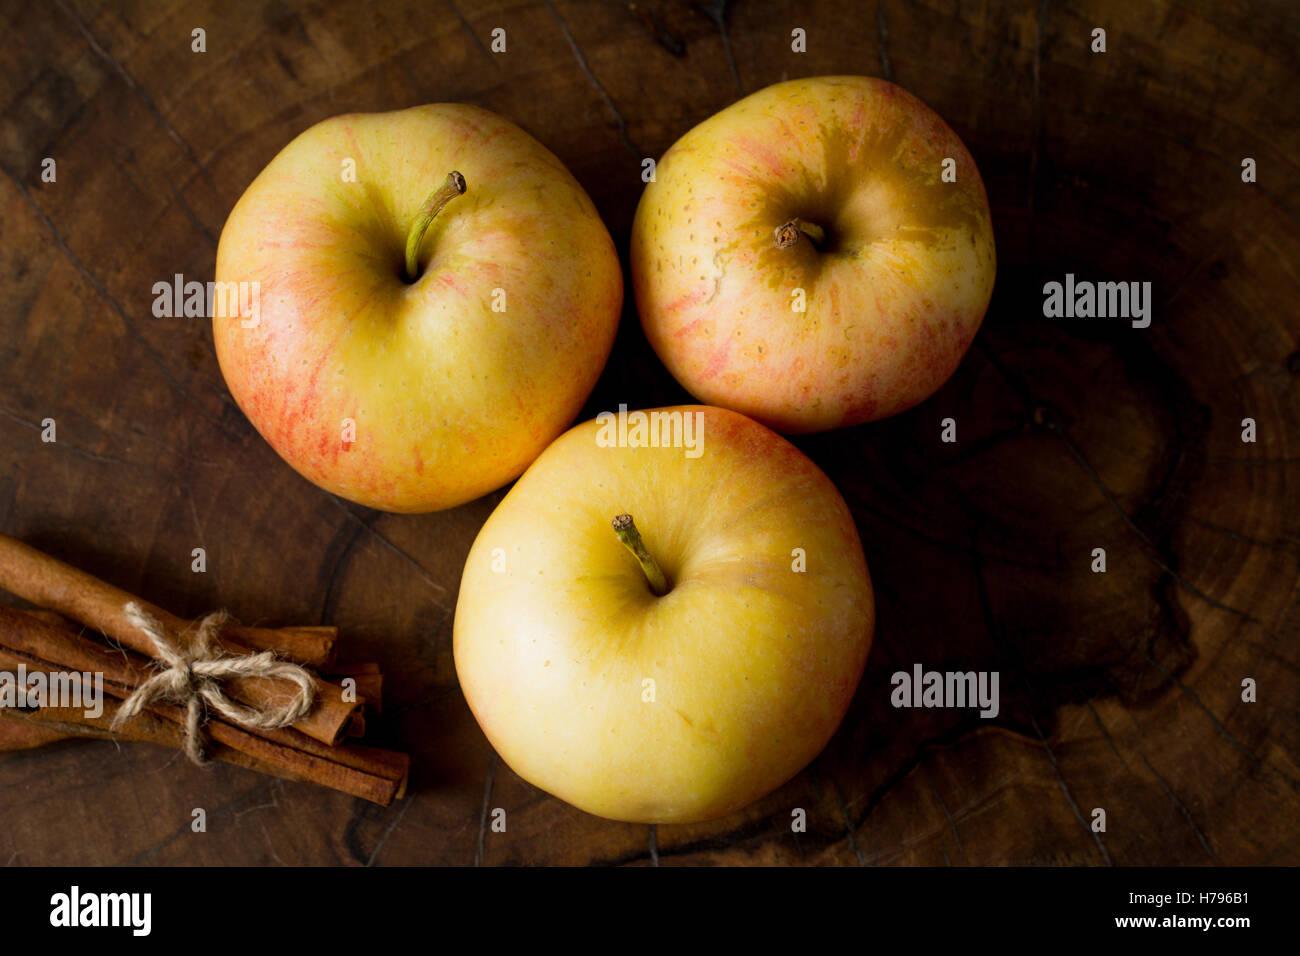 Apples and cinnamon sticks, food still life Stock Photo